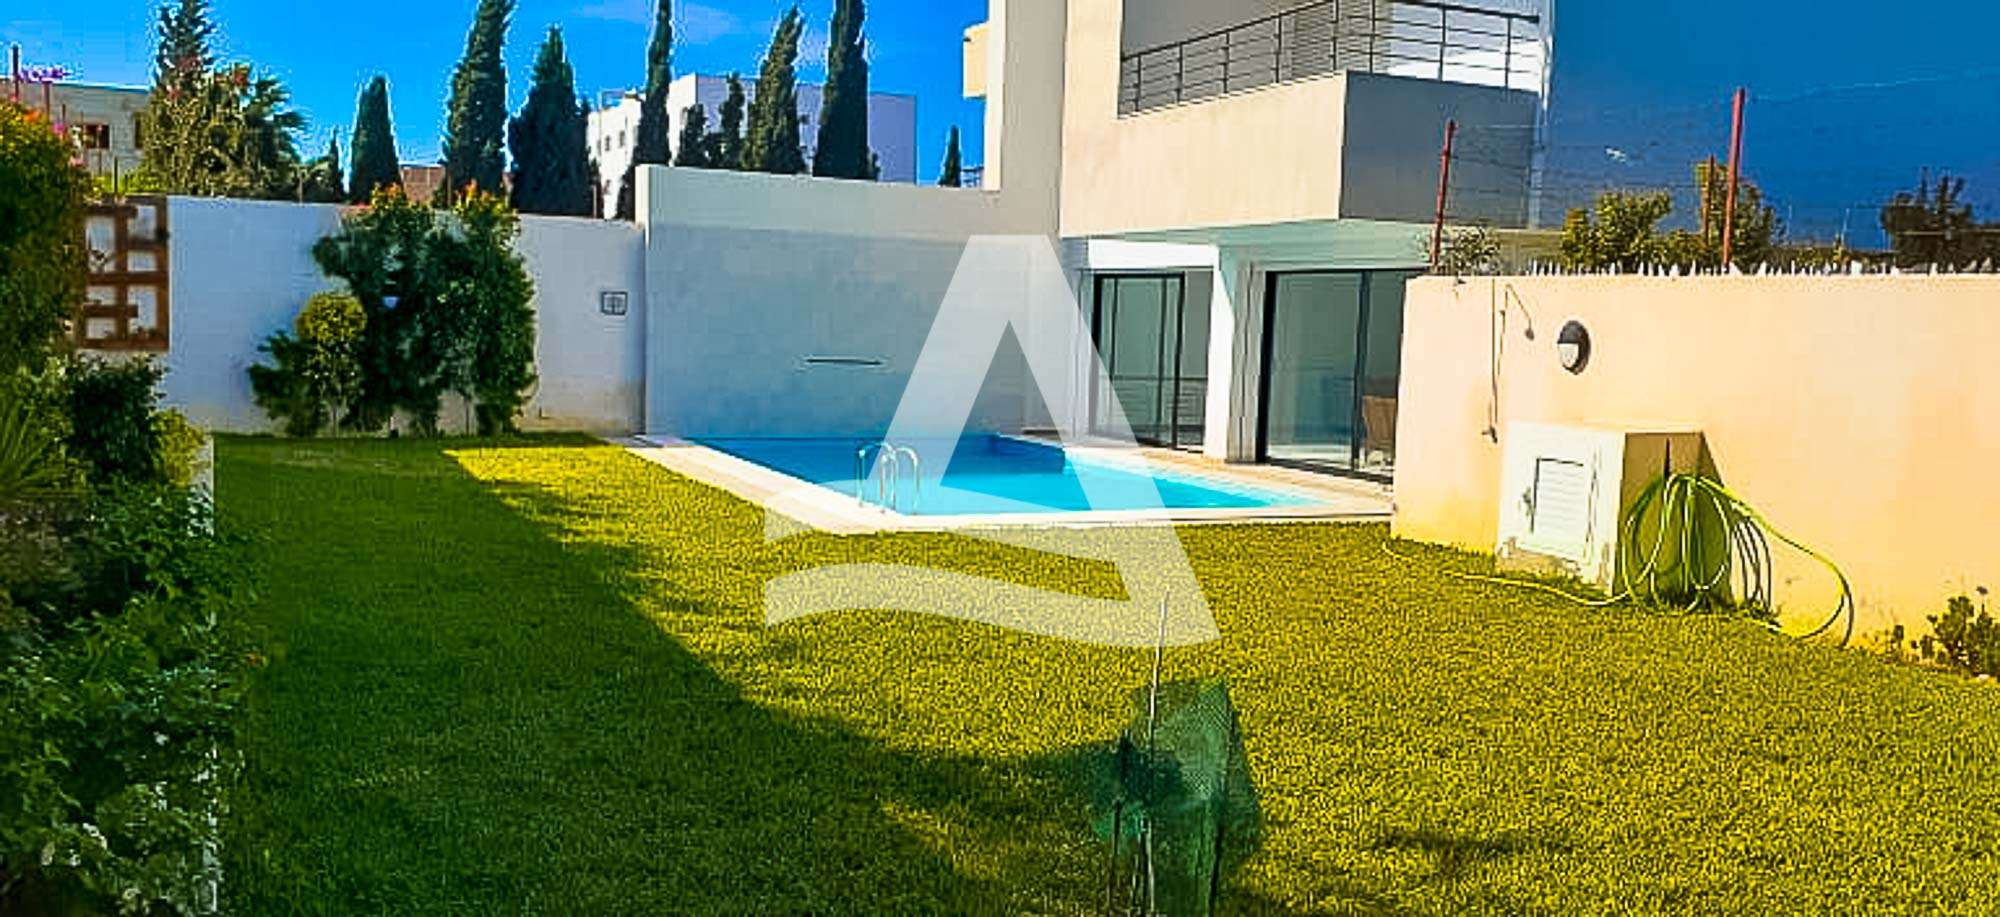 httpss3.amazonaws.comlogimoaws_Arcane_immobilière_la_Marsa-_location_-_vente_la_marsa_7_sur_21_1574354370806-1